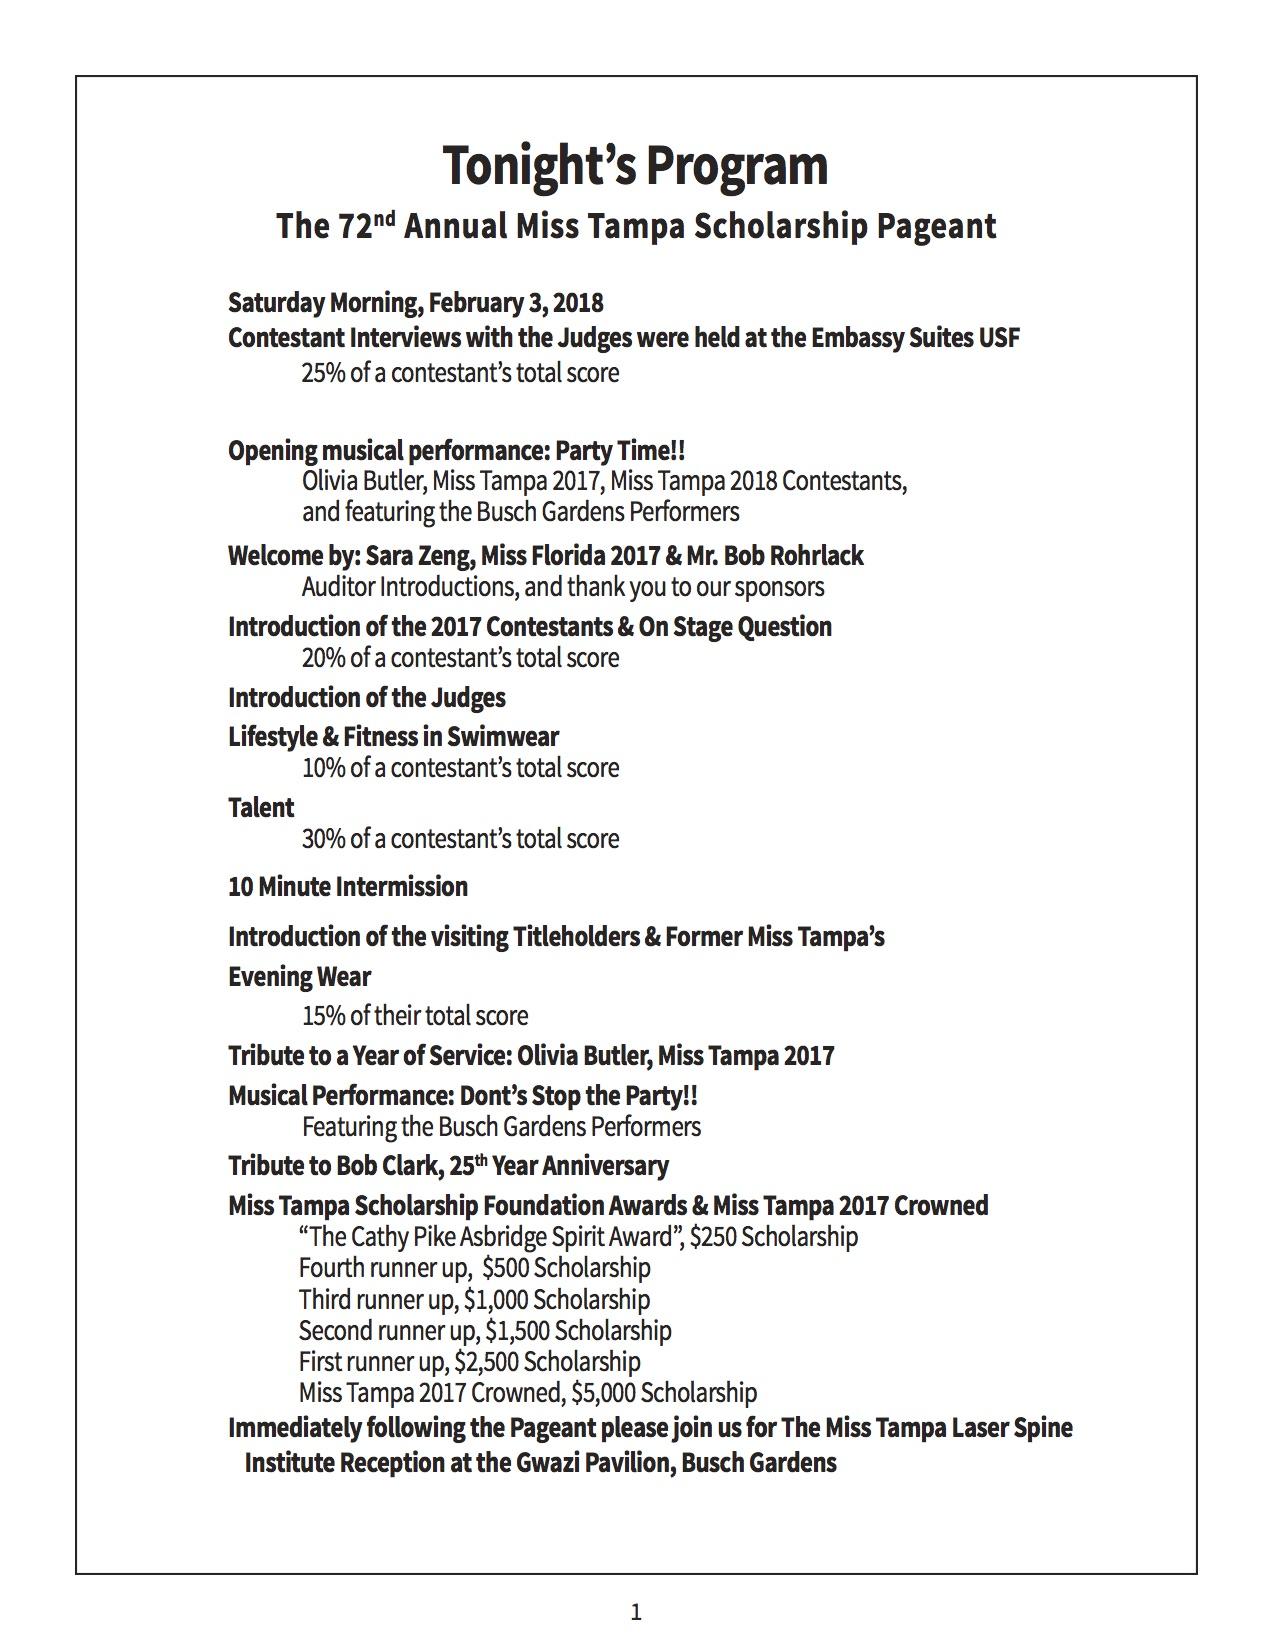 Miss Tampa 2018 program final 1.30.18.jpg